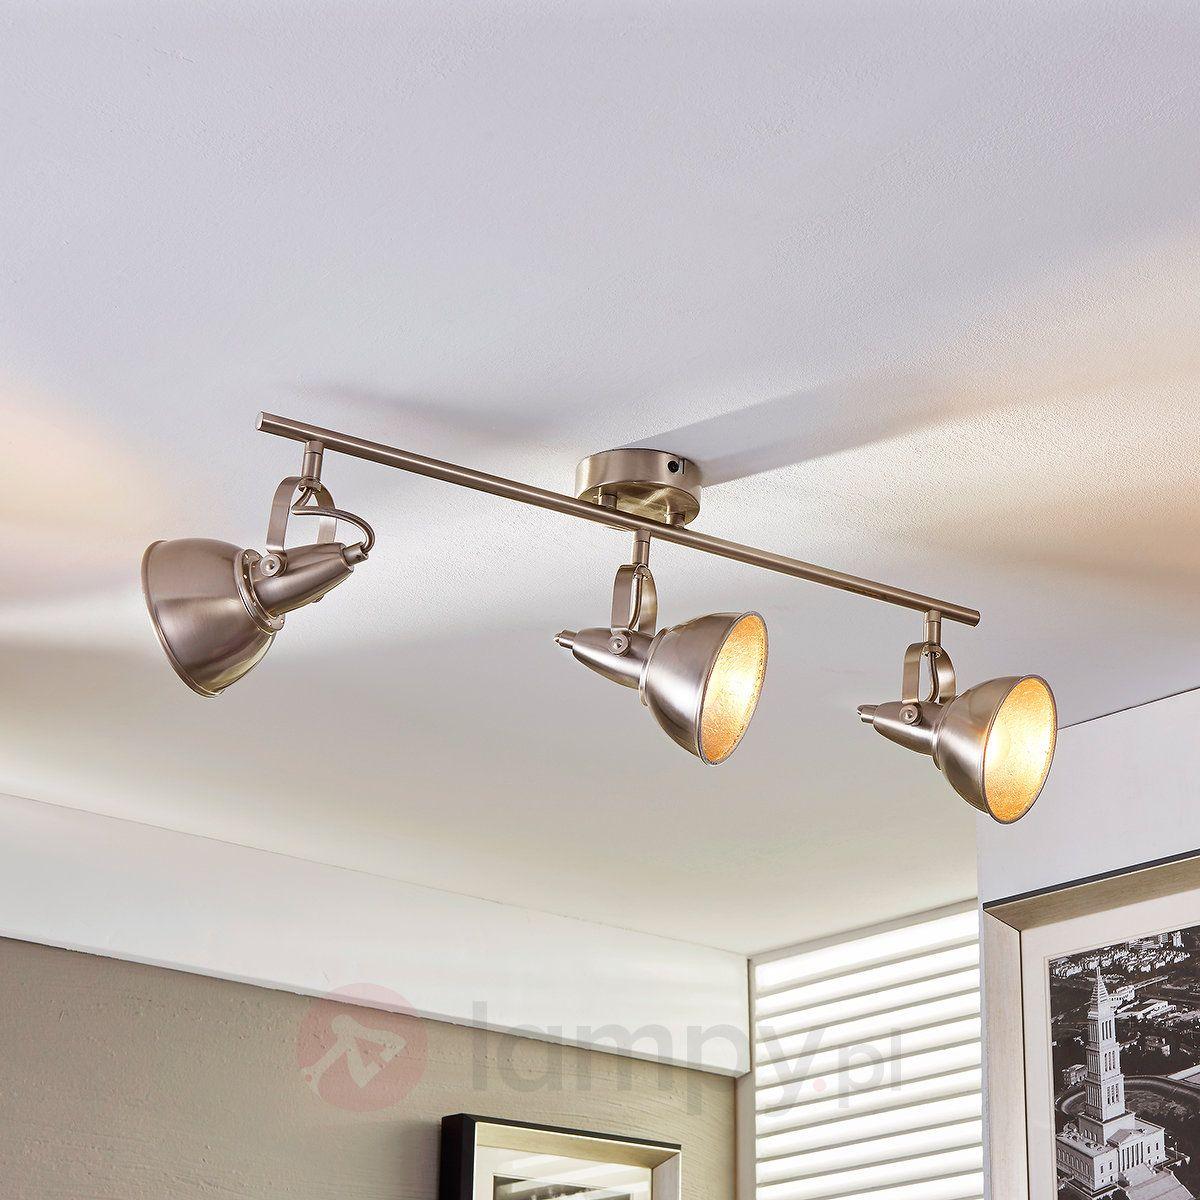 Julin Lampa Sufitowa Z Trzema Kloszami Ceiling Lamp Industrial Track Lighting Gold Wall Lights